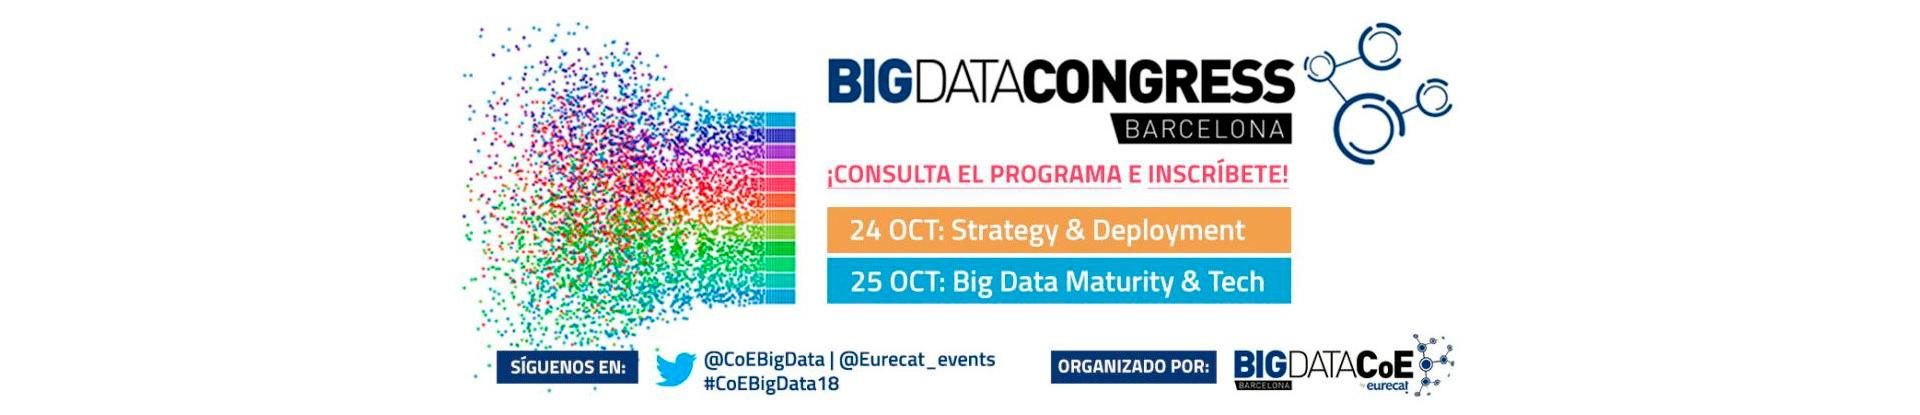 Big_Data_Congress_Cabecera